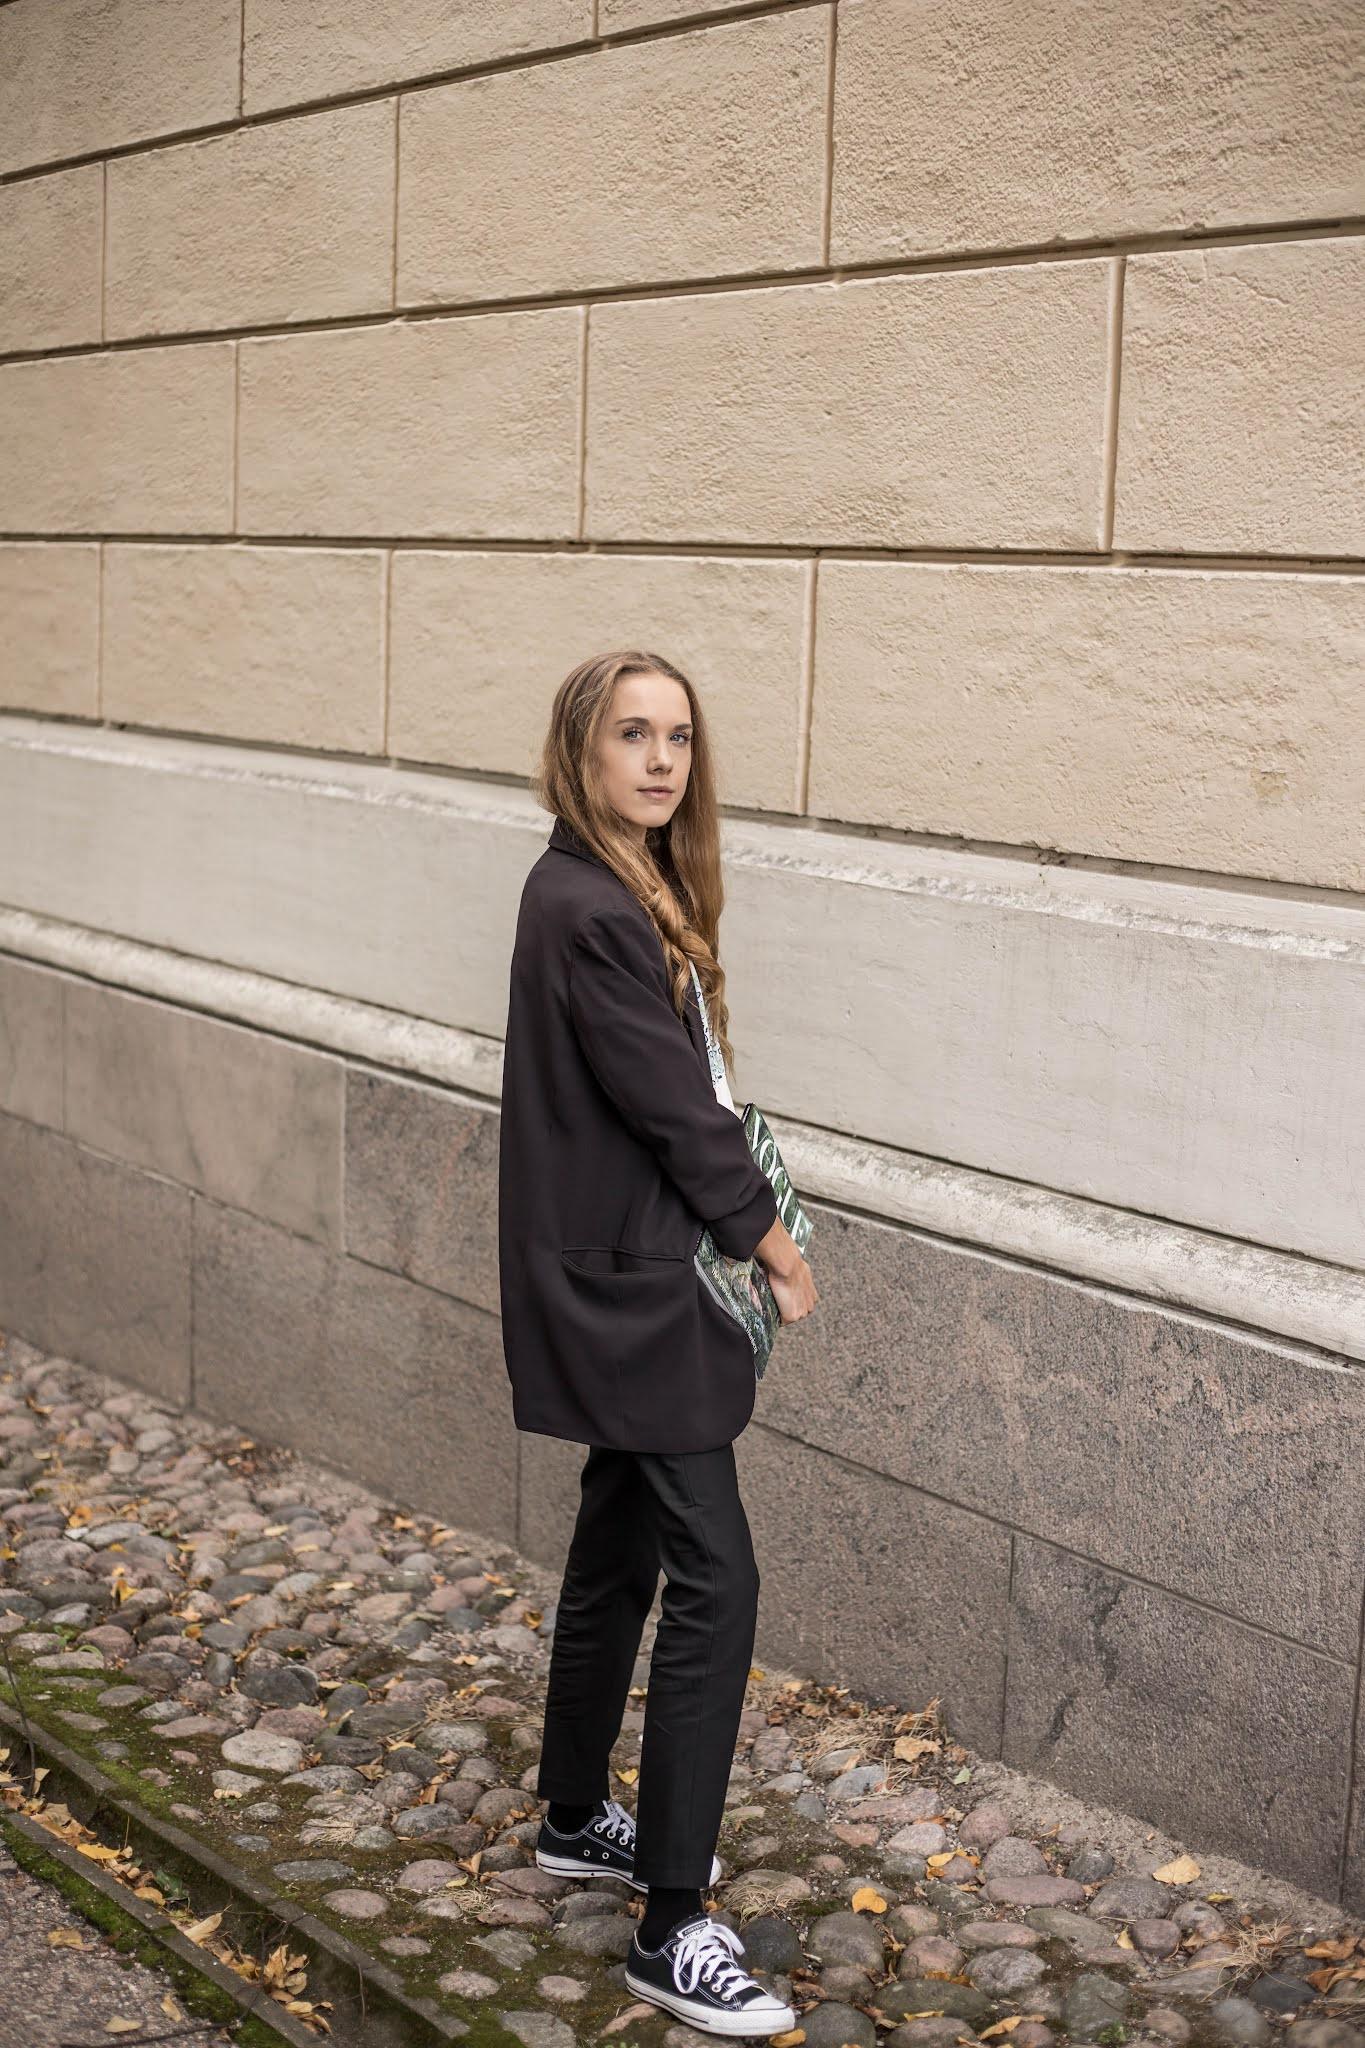 eettiset suomalaiset muotibrändit // ethical Finnish fashion brands